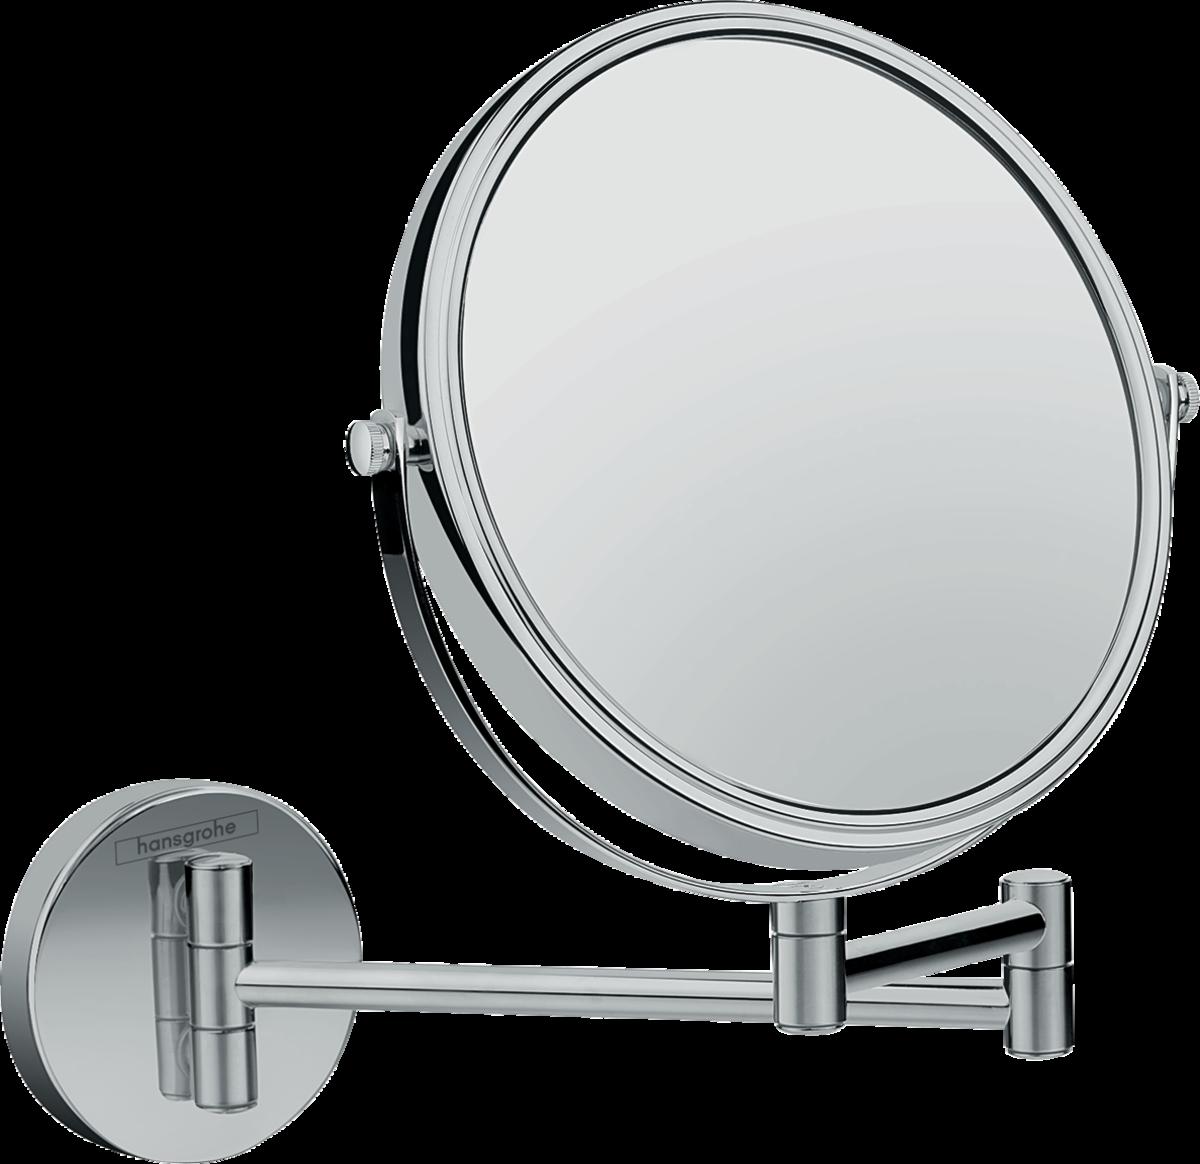 Косметическое зеркало Hansgrohe Logis Universal 73561000, трехкратное увеличение зеркало косметологическое hansgrohe logis universal 73561000